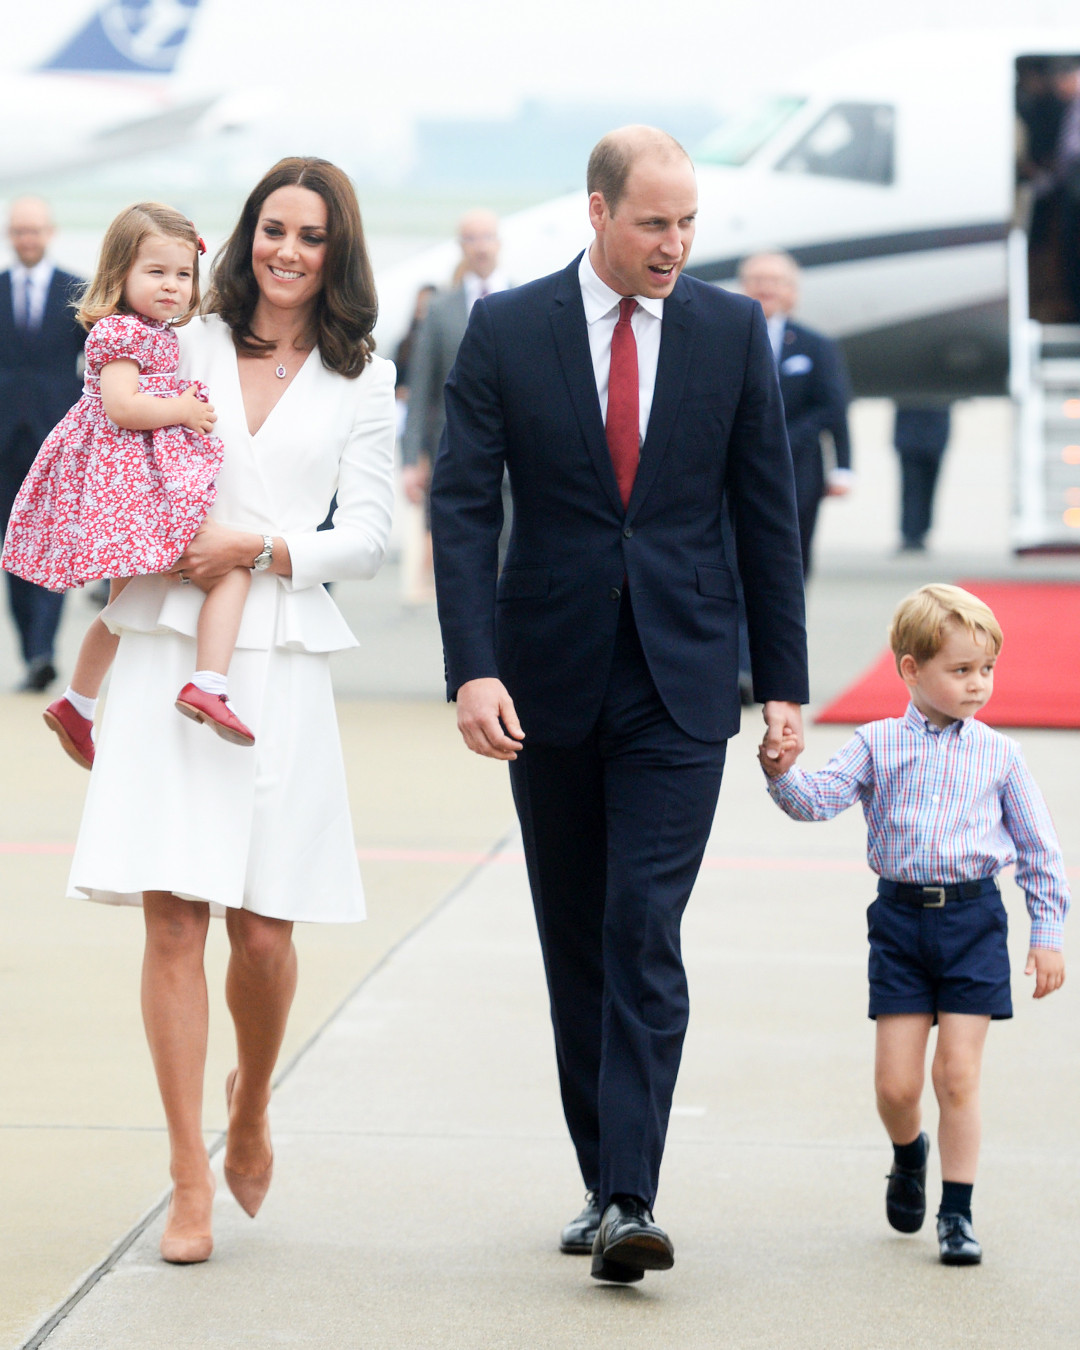 ESC: Prince WIlliam, Kate Middleton, Prince George, Princess Charlotte, Royals Gift Guide